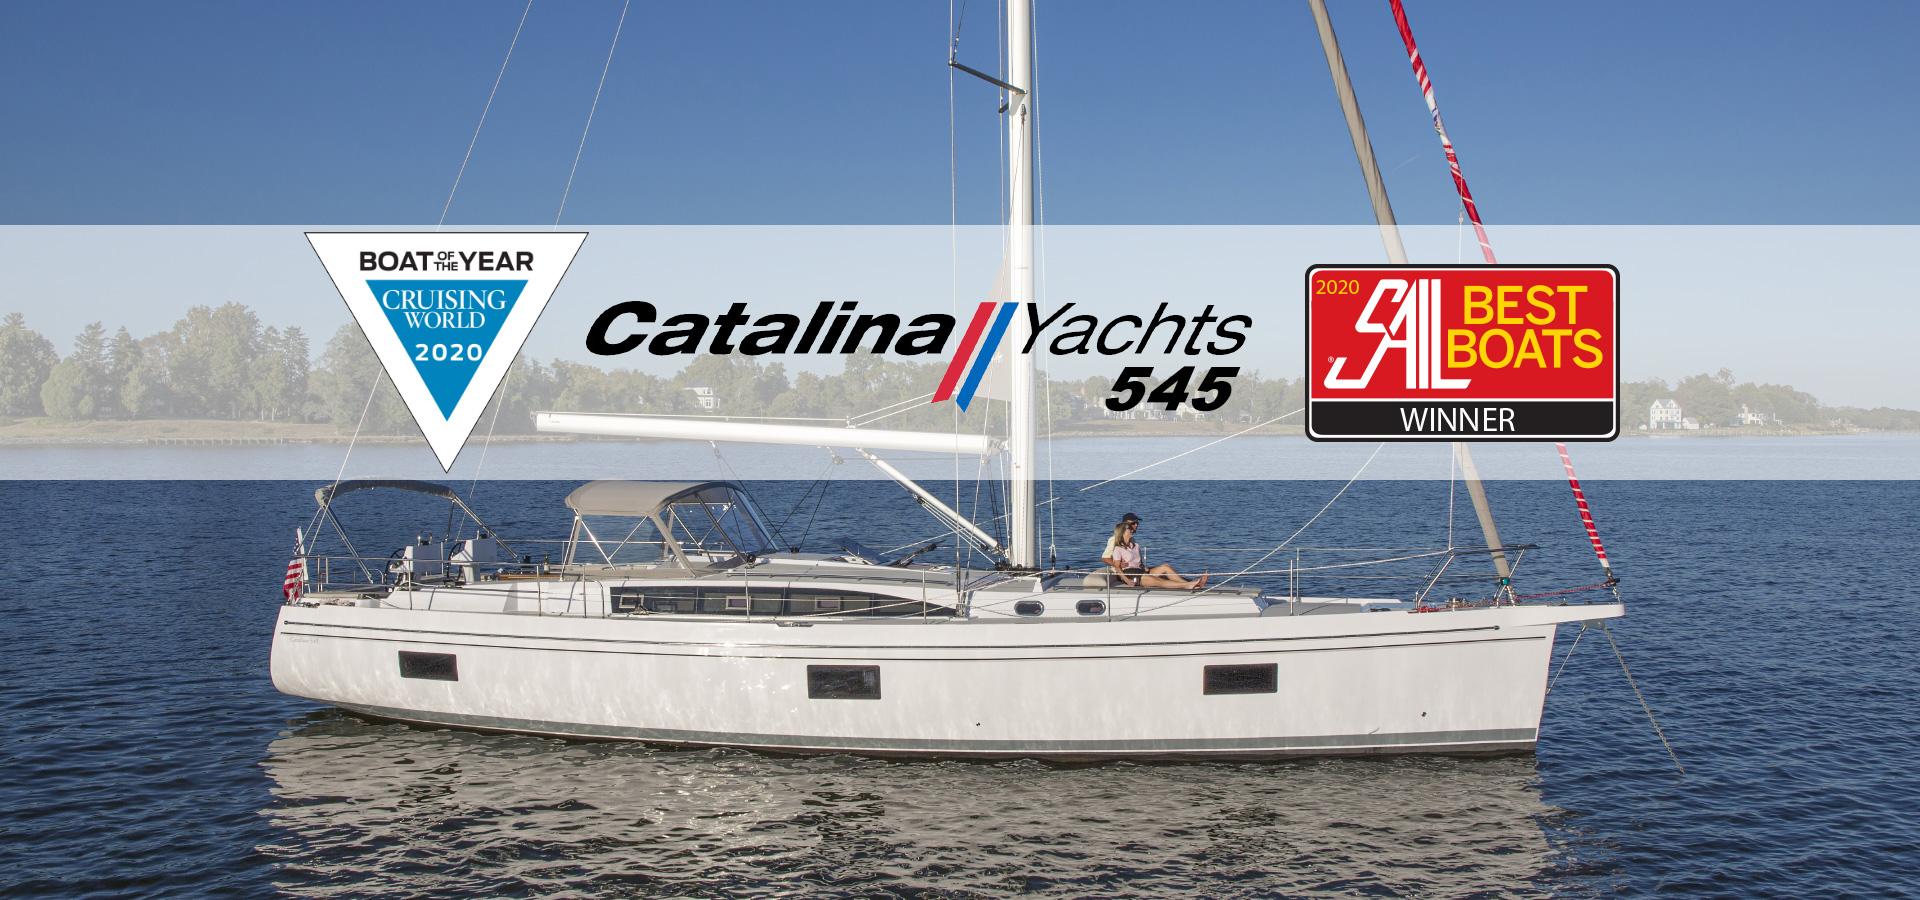 Capri Sailing - YouTube